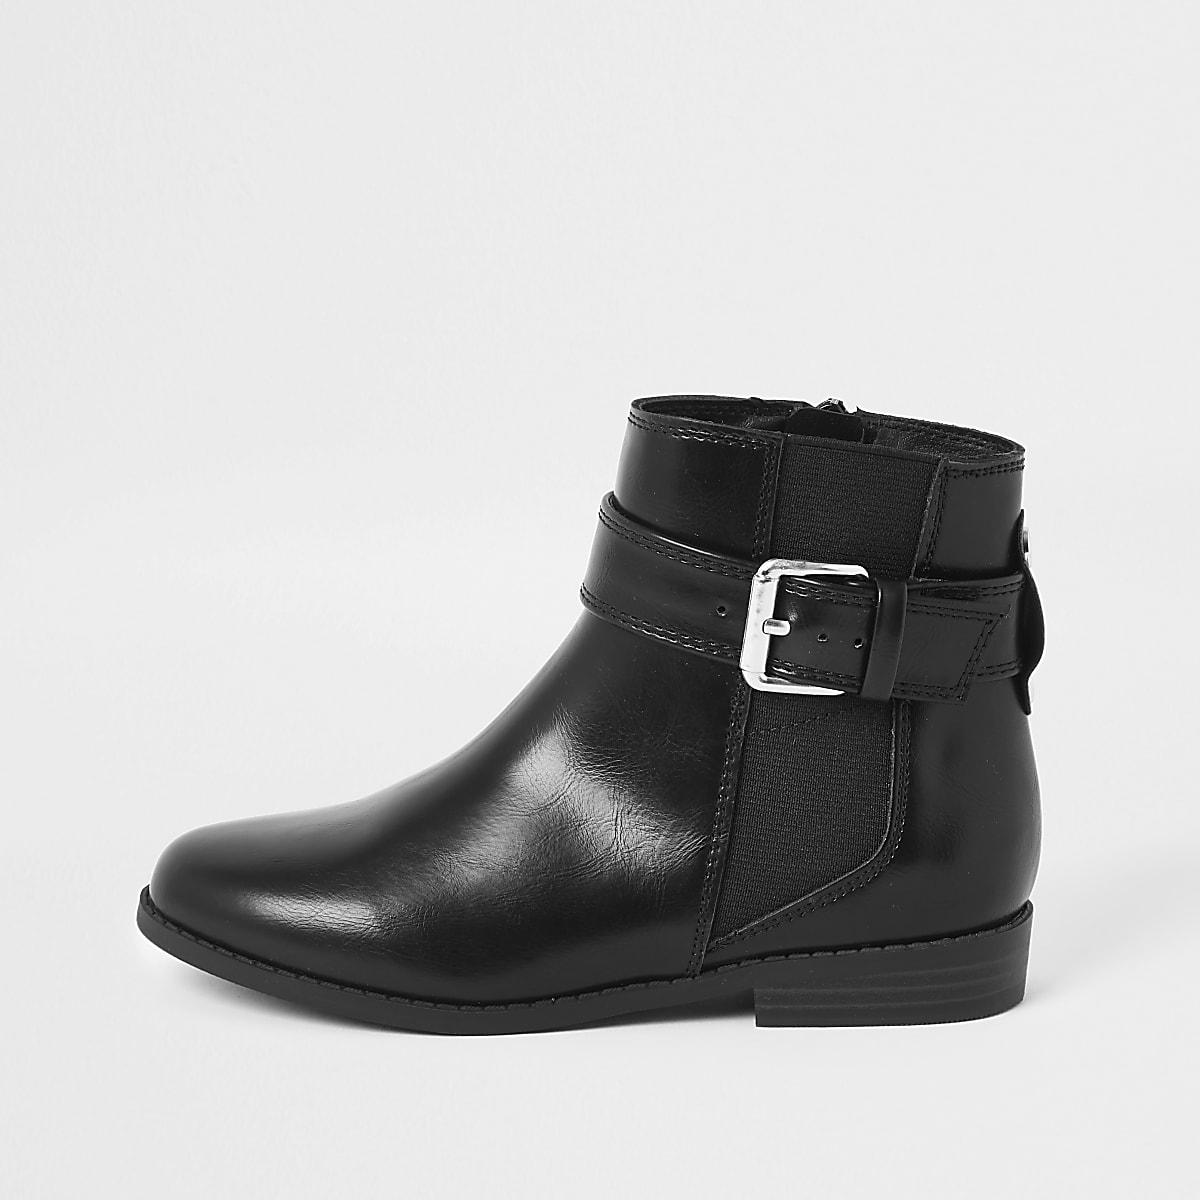 Girls black buckle boots